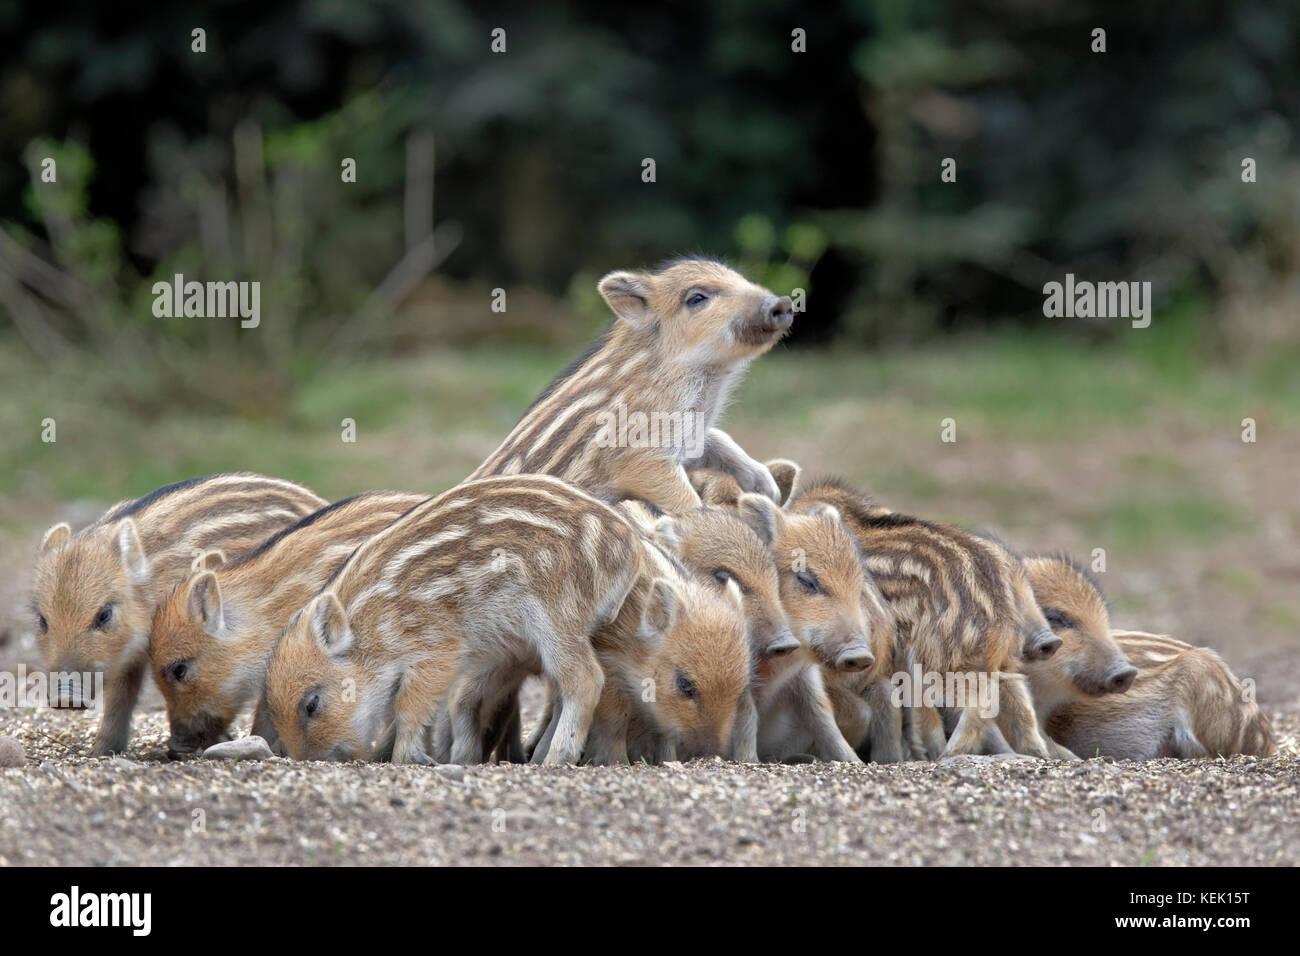 Wild Boars (Sus scrofa), piglet, group, Schleswig-Holstein, Germany,  Europe - Stock Image